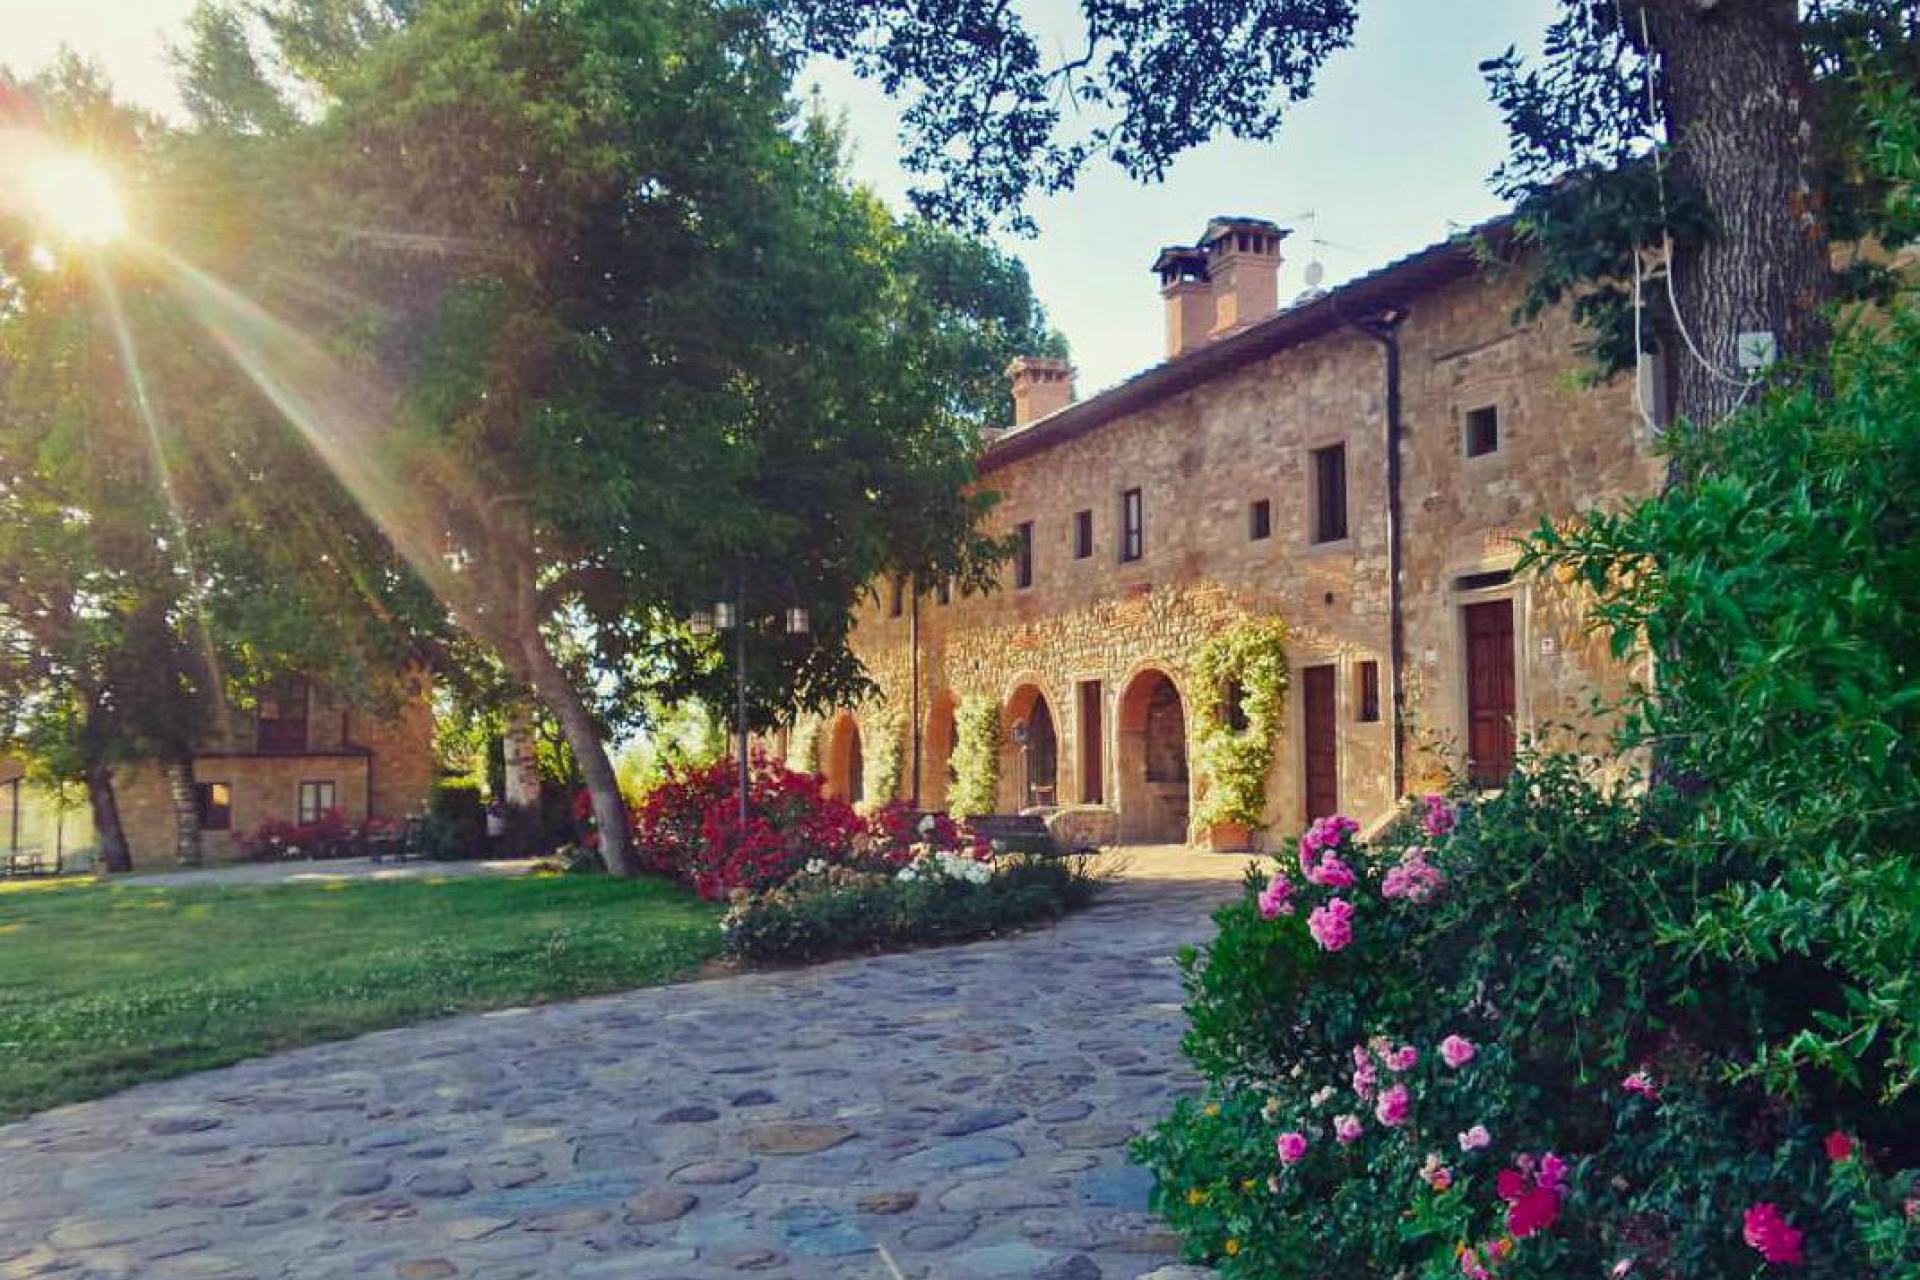 Agriturismo Toscane Agriturismo Toscane – huisjes en appartementen   myitaly.nl